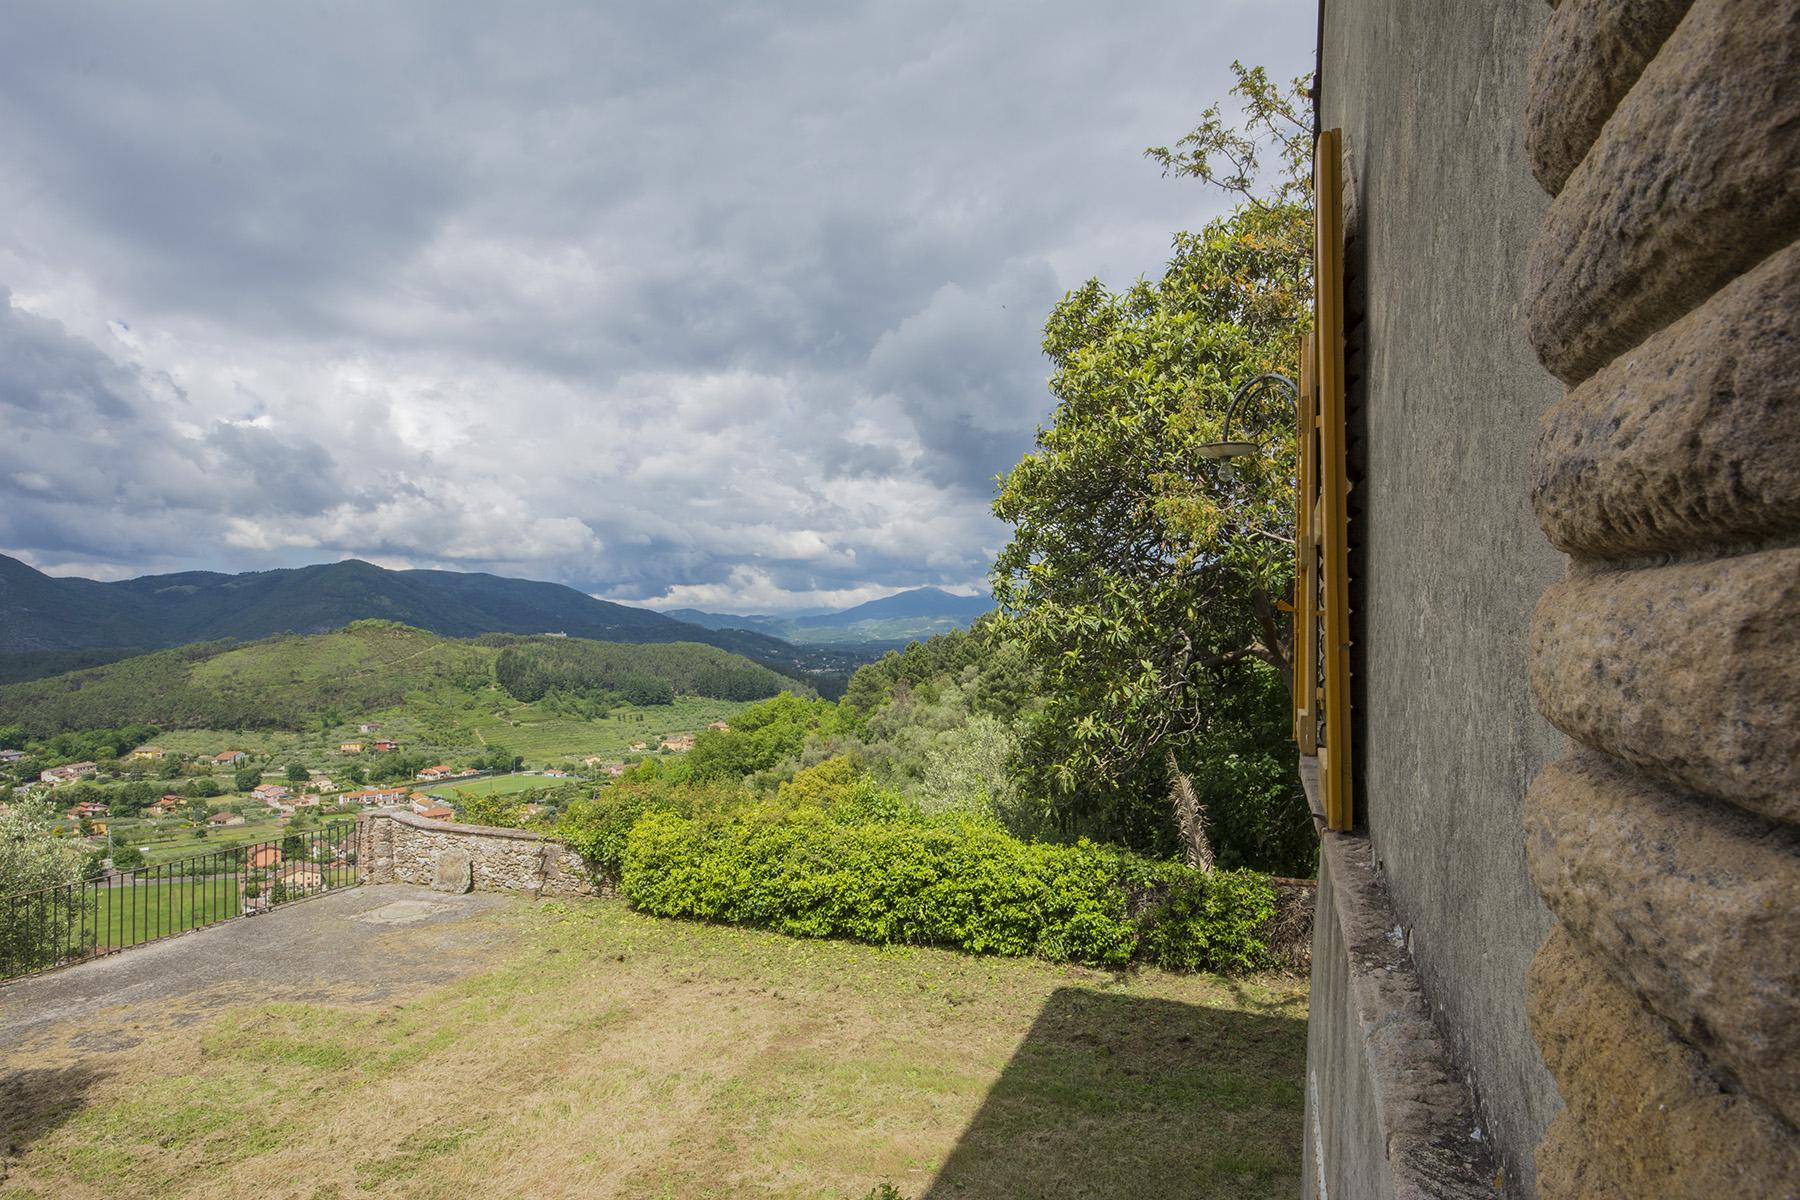 Villa in Vendita a Capannori: 5 locali, 490 mq - Foto 13